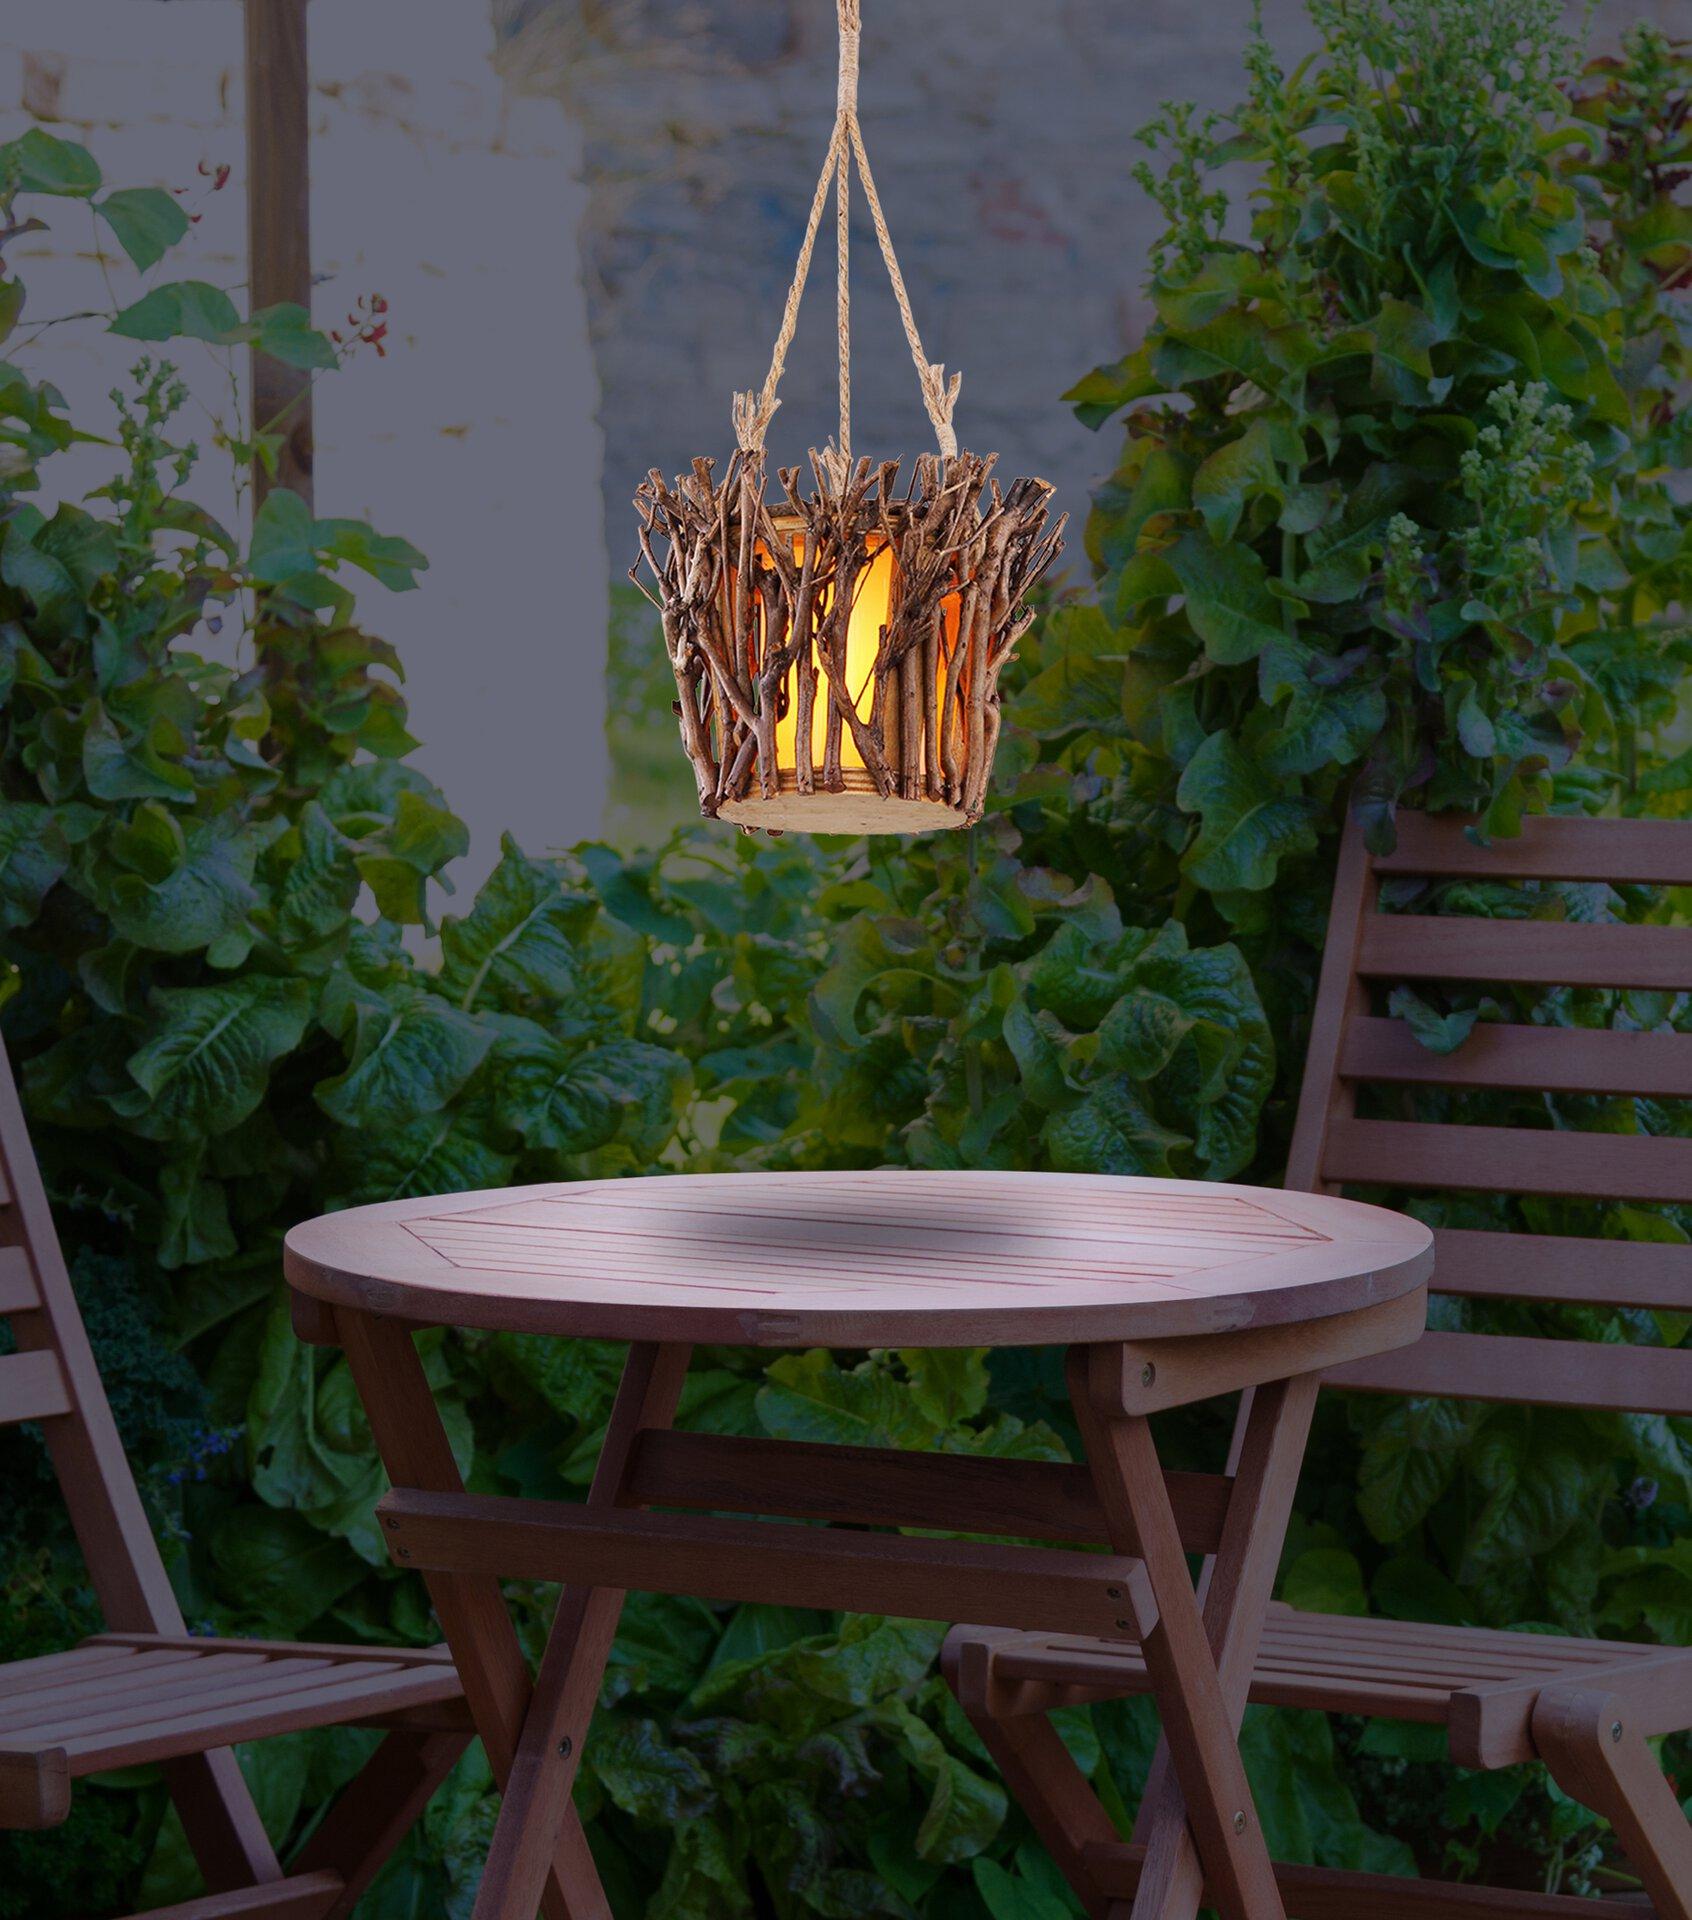 Solarleuchte Solar Holz Globo Holz braun 26 x 62 x 26 cm